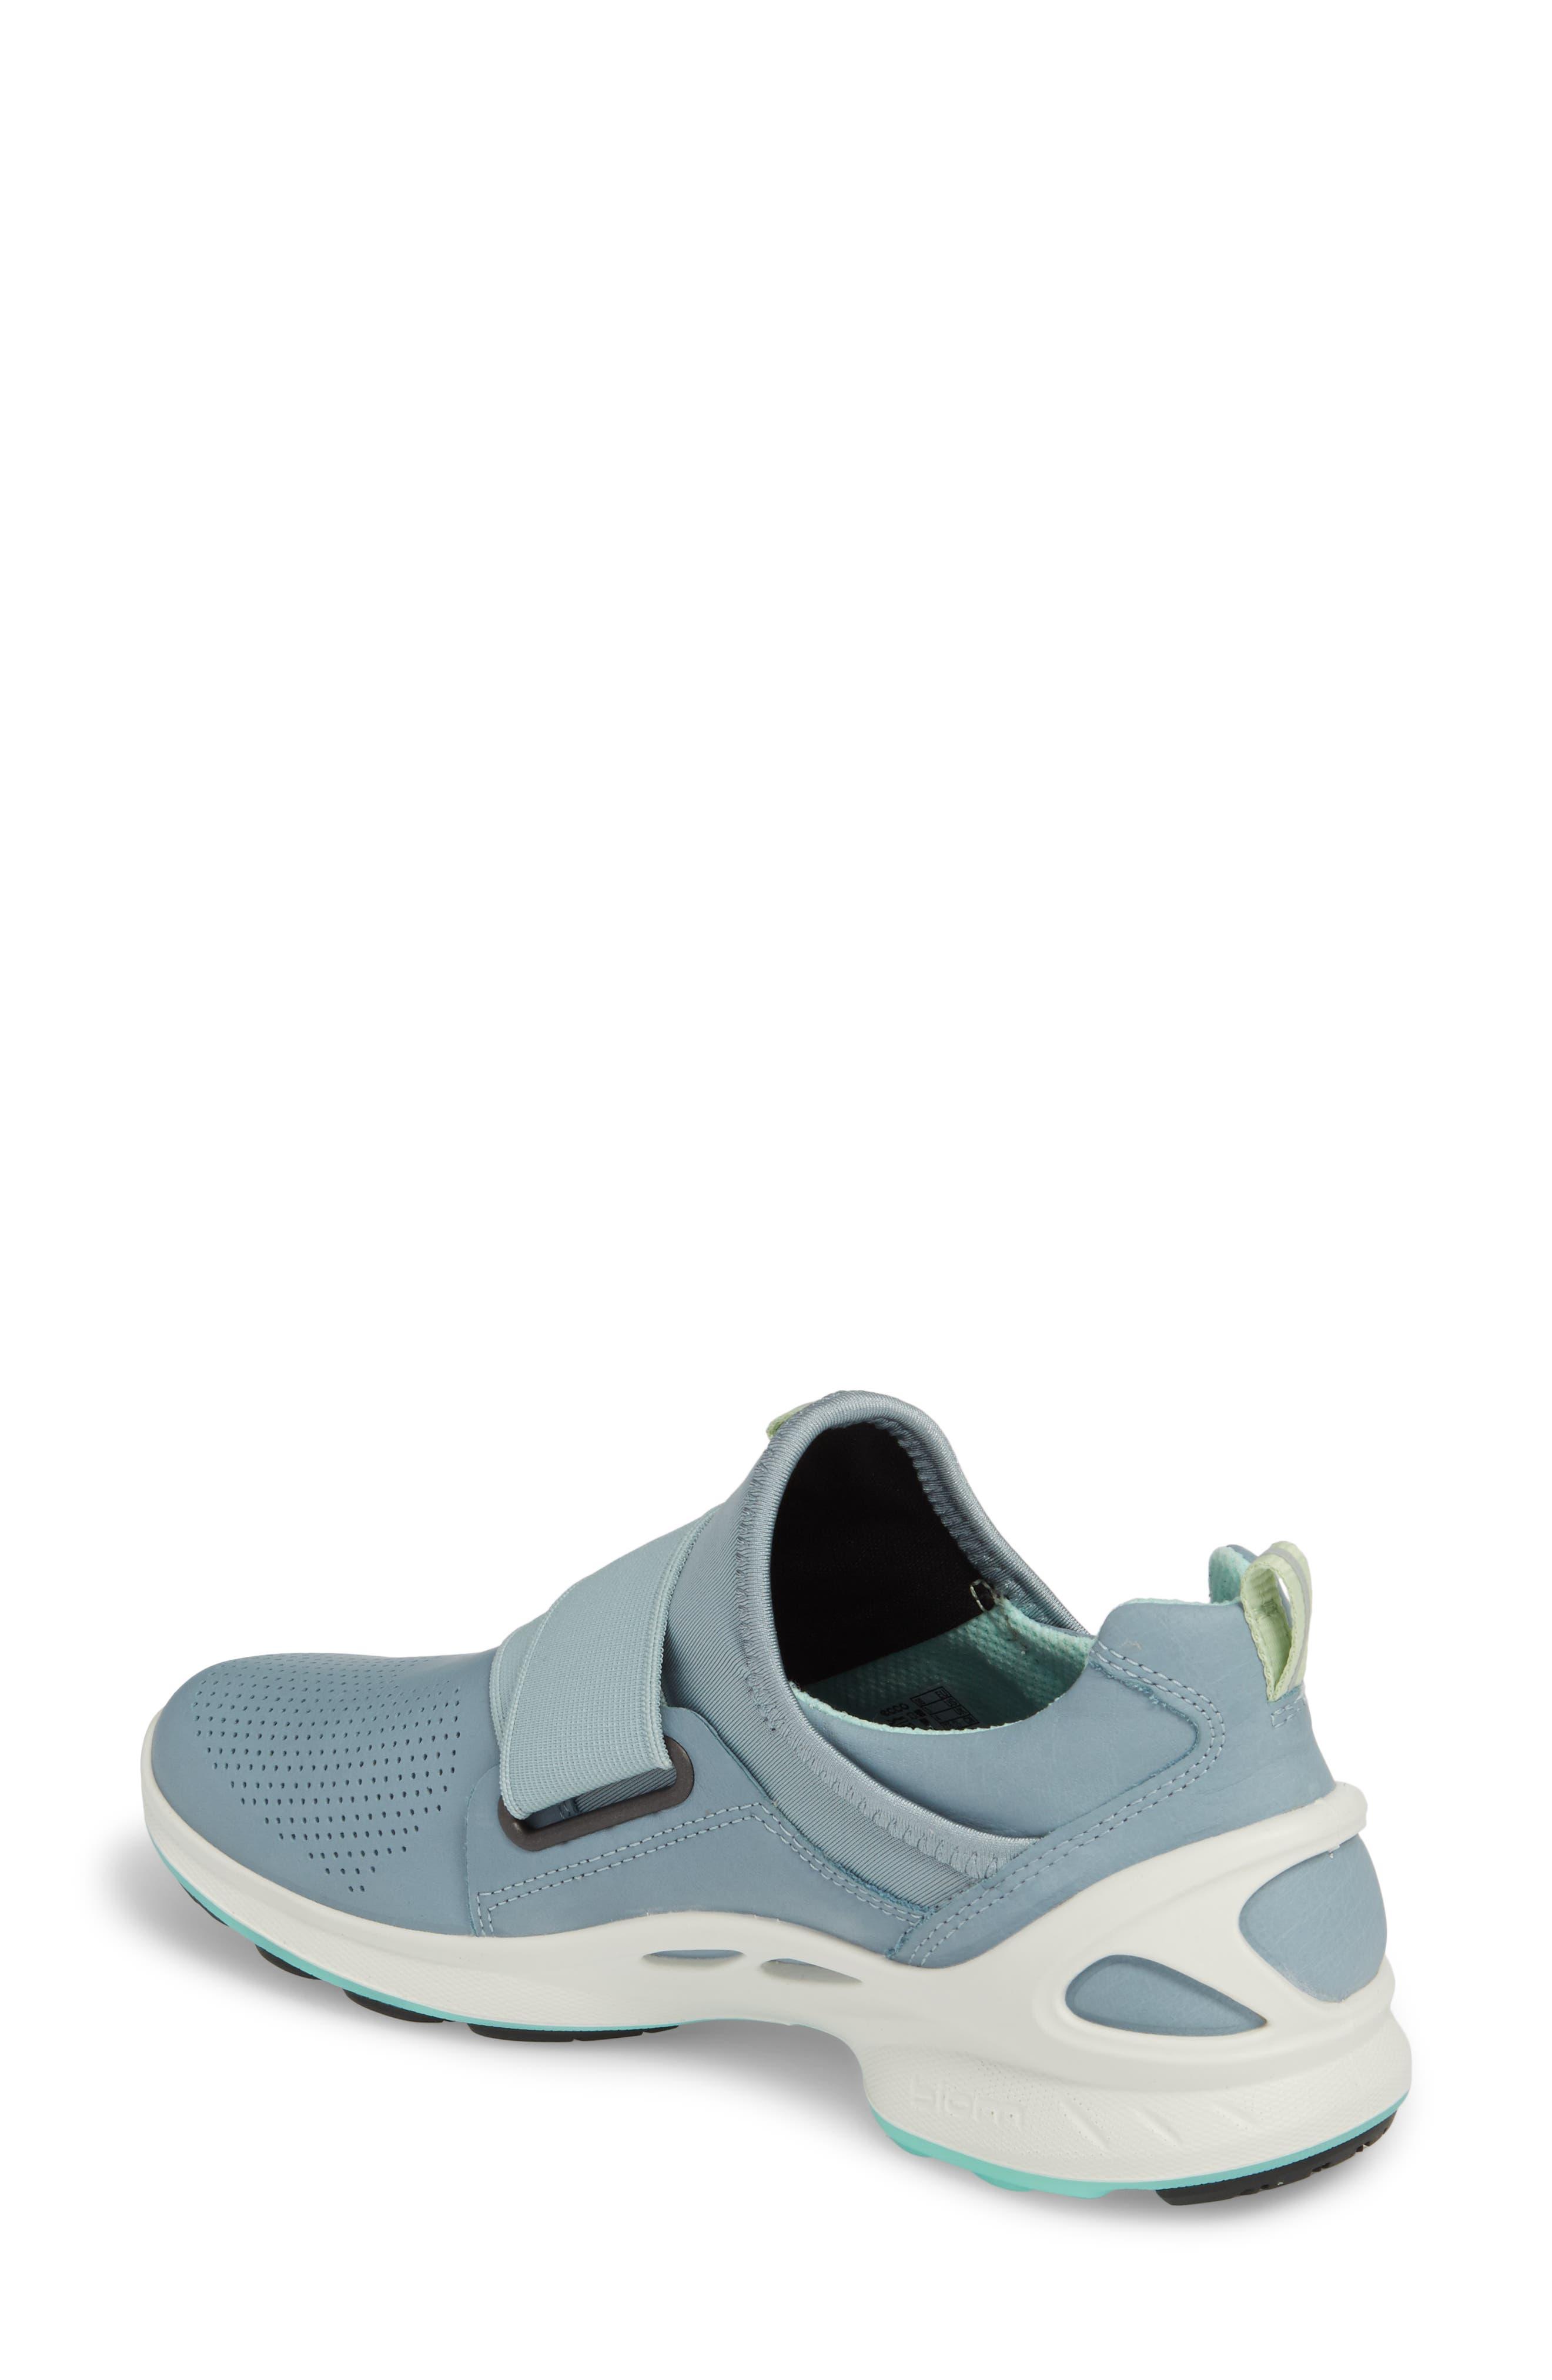 BIOM Fjuel Band Sneaker,                             Alternate thumbnail 2, color,                             Arona Fabric